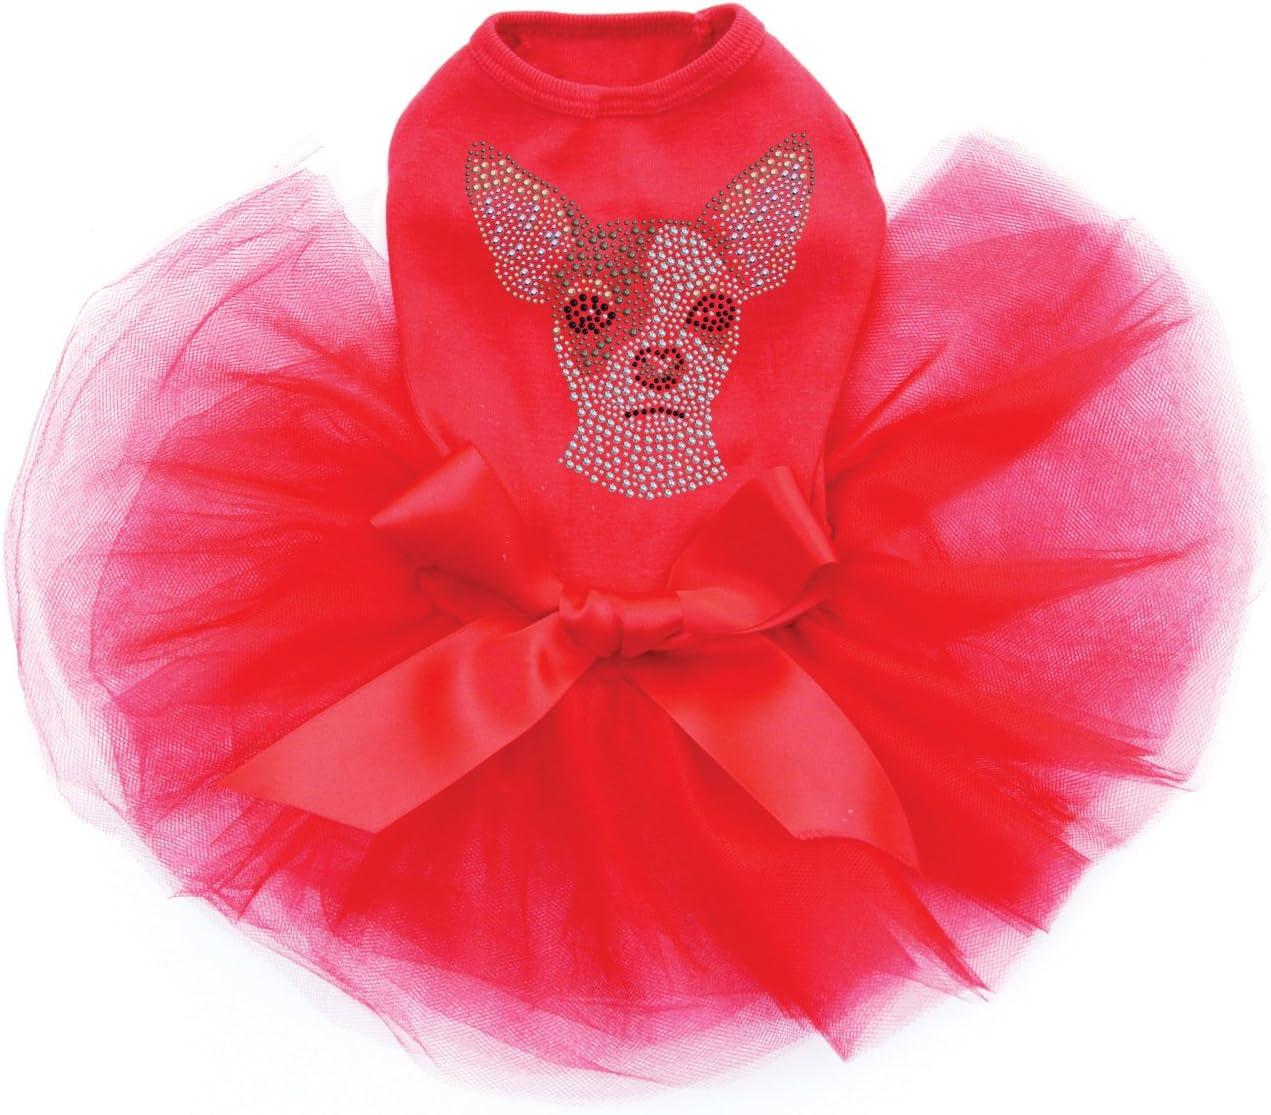 Chihuahua Face Bling store Rhinestone Dog Washington Mall Tutu Red Dress XL